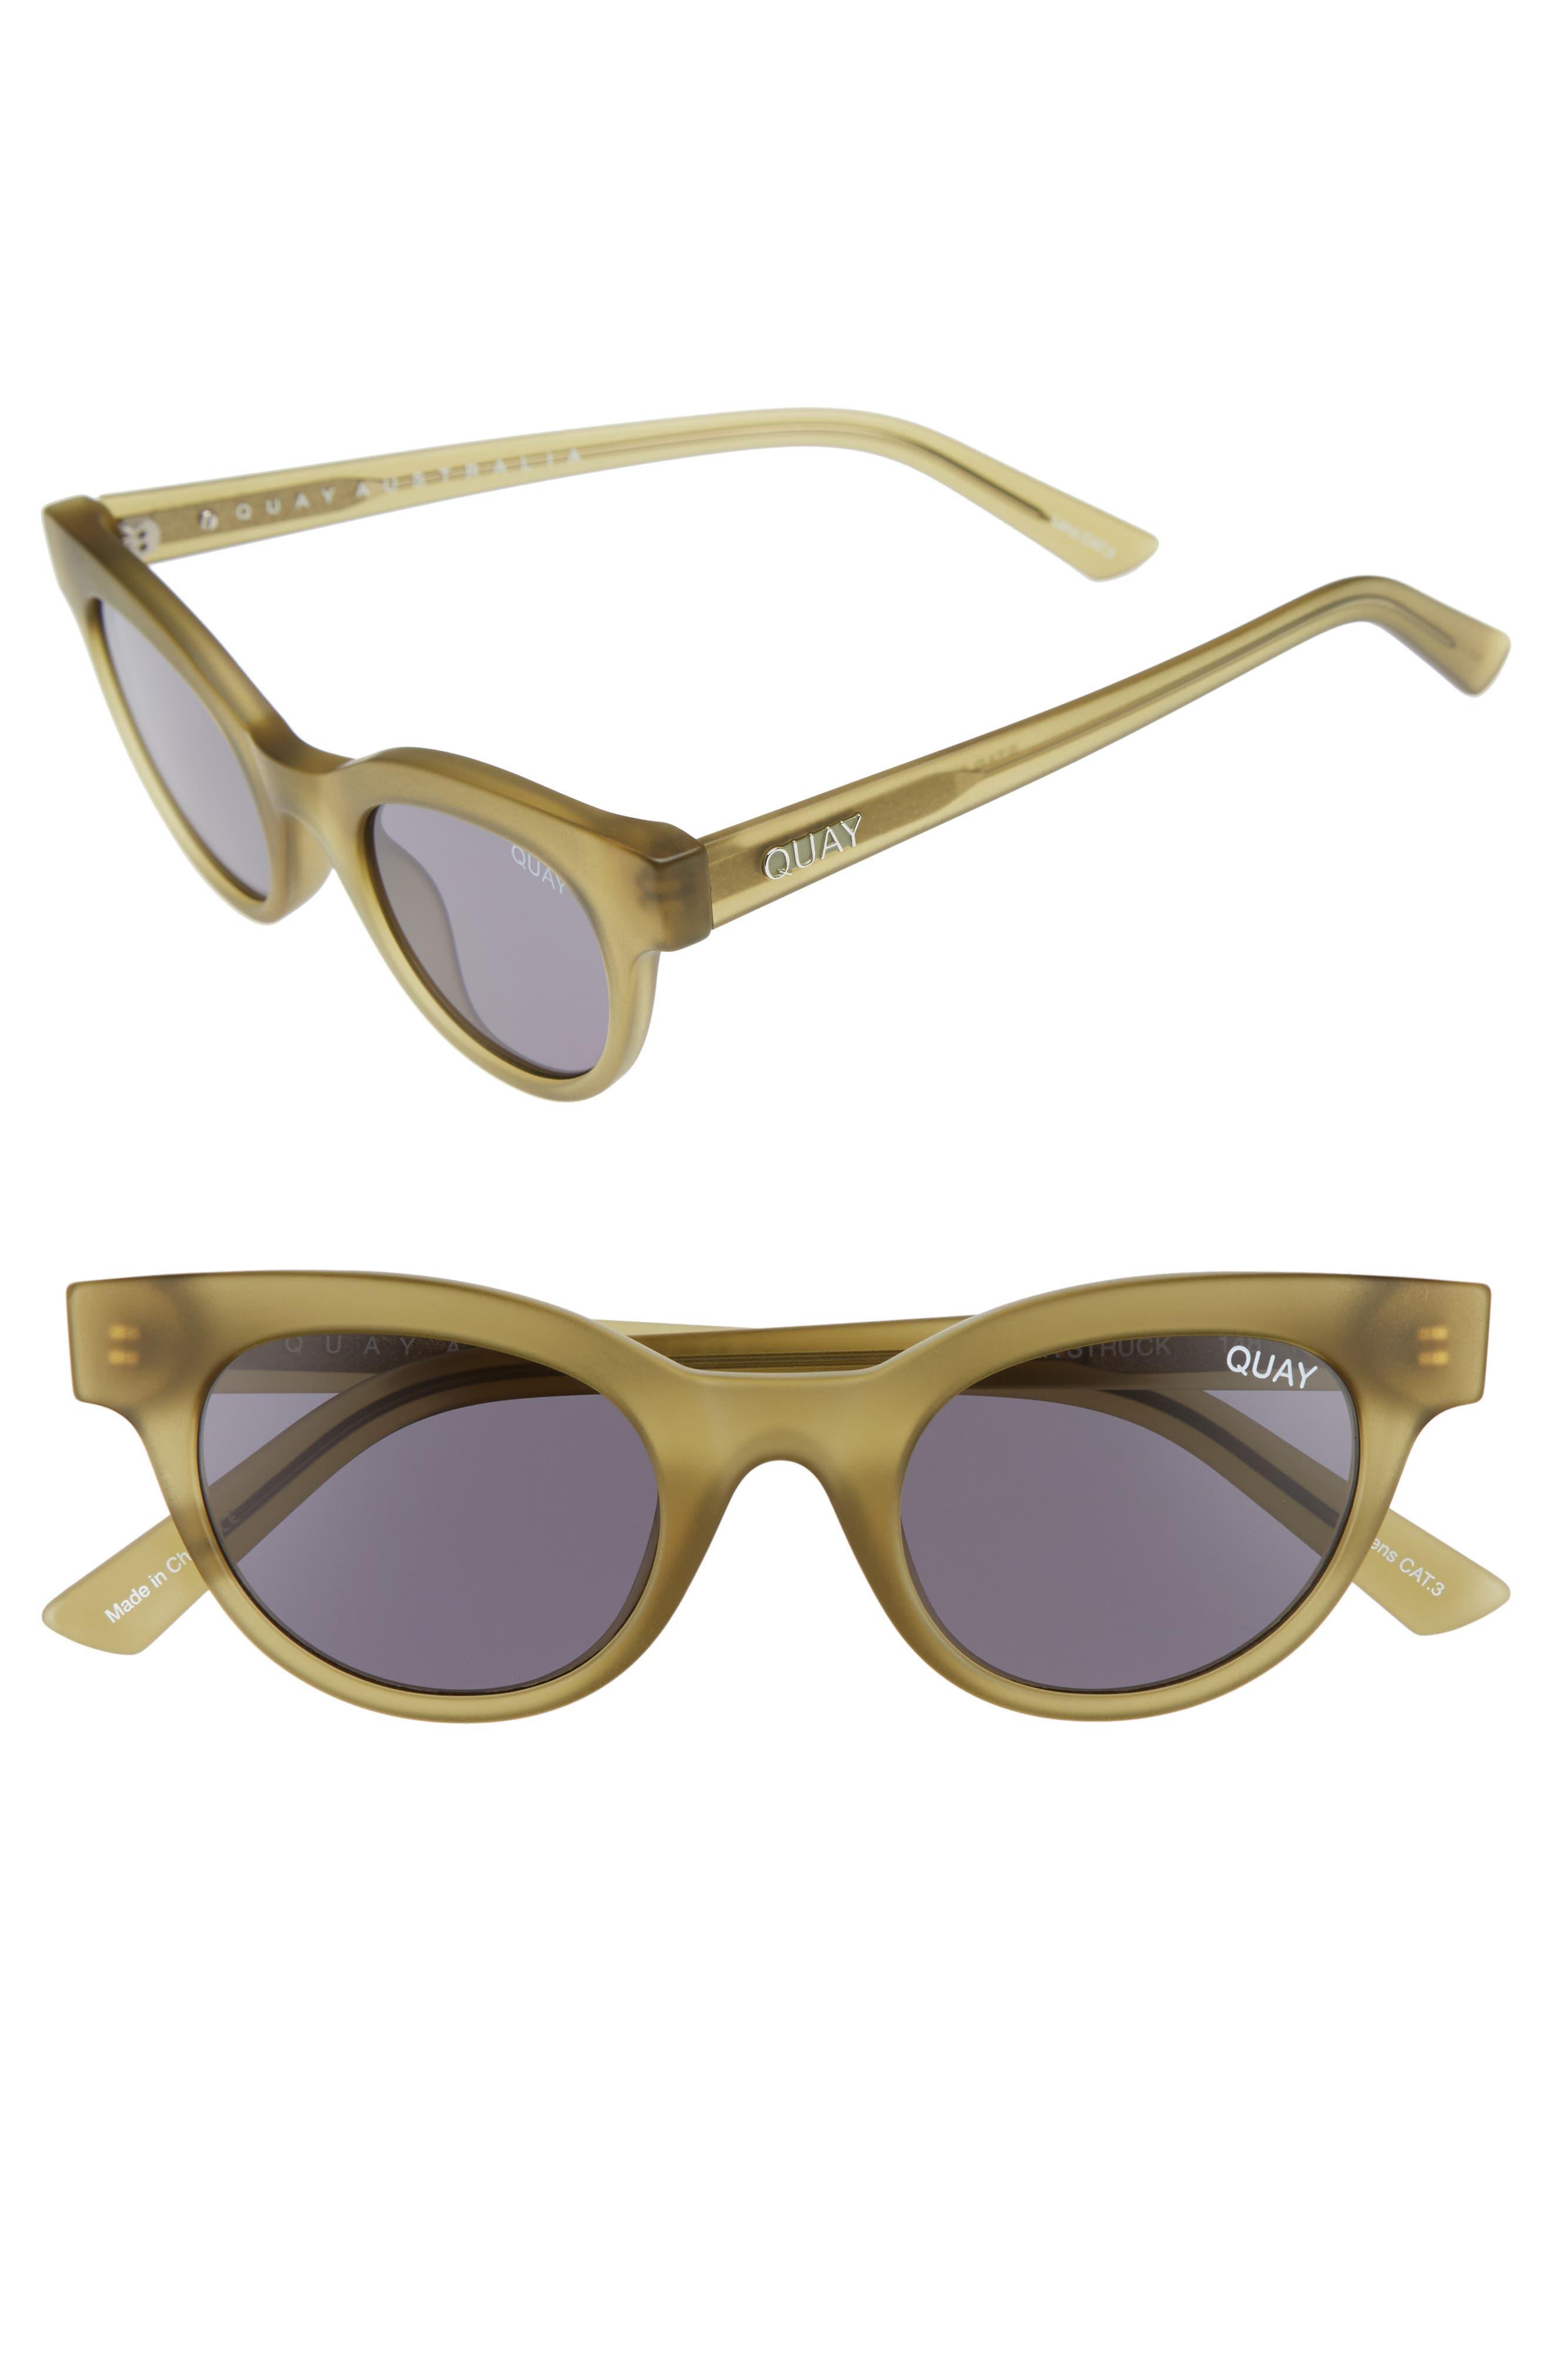 #QUAYxKYLIE Starstruck 48mm Cat Eye Sunglasses